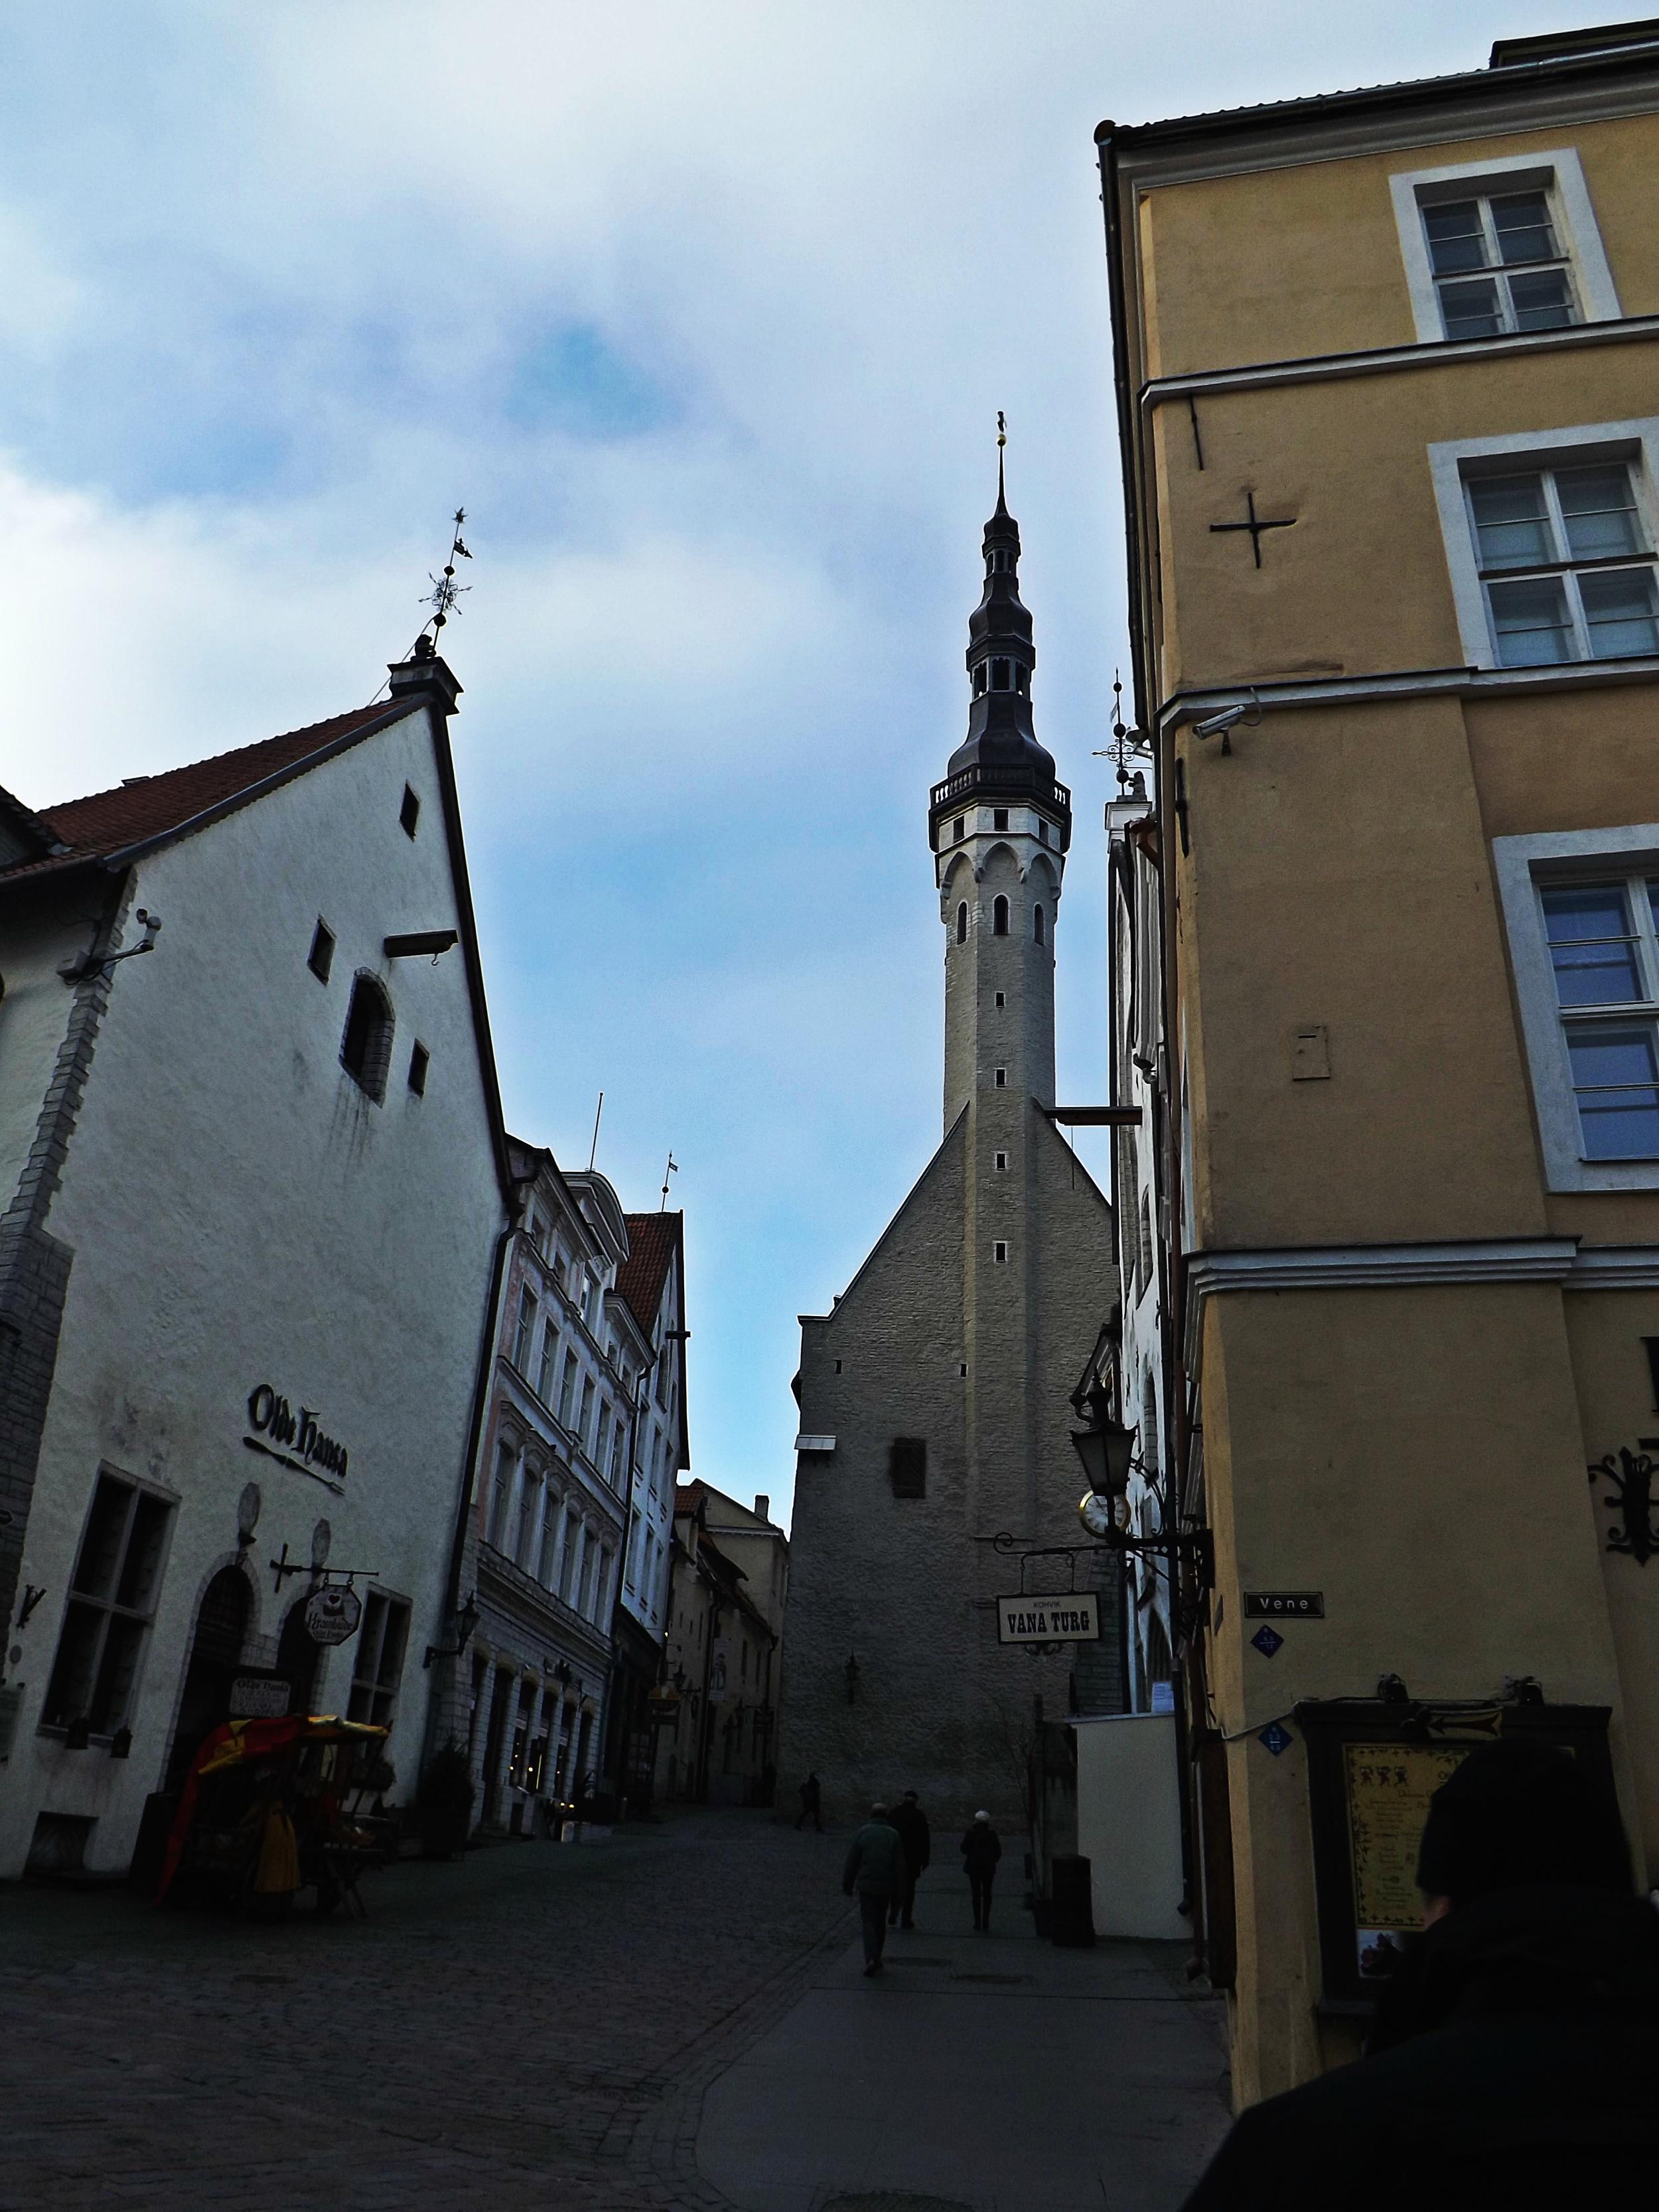 Tallinn Buildings in the Day | Tall Girl Meets World